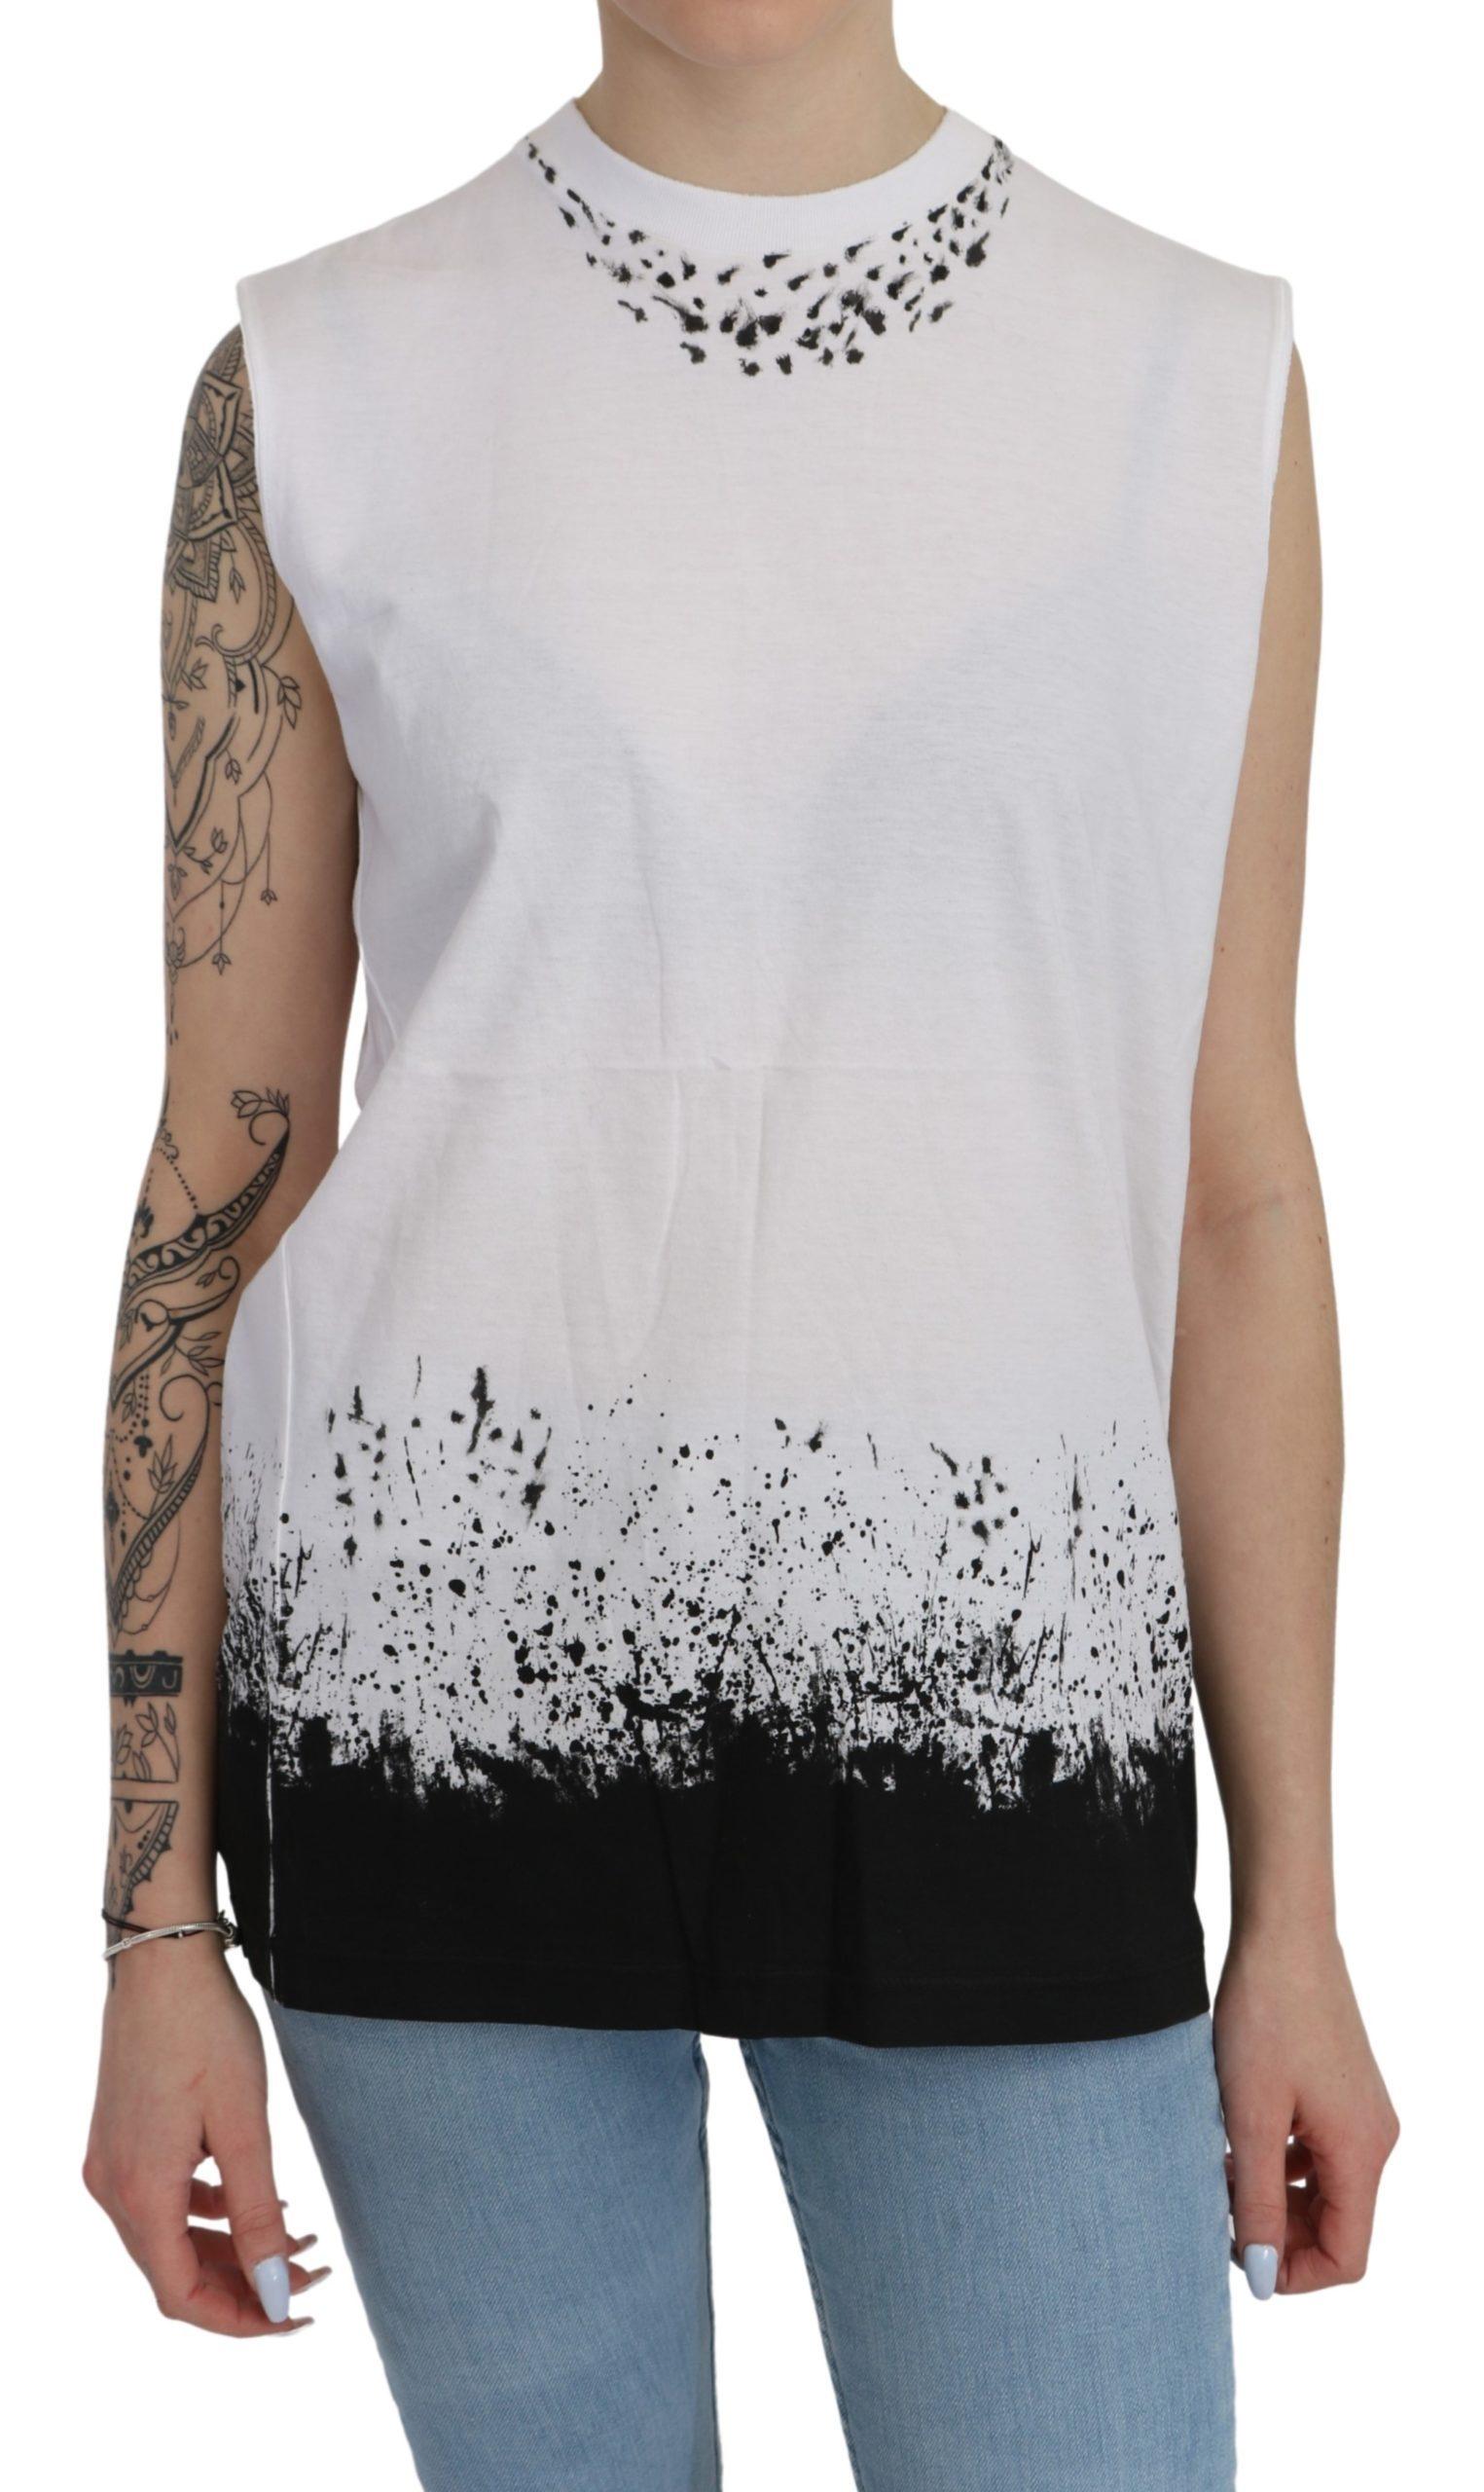 Dsquared² Women's Sleeveless Tank Cotton Top White TSH4333 - IT44|L